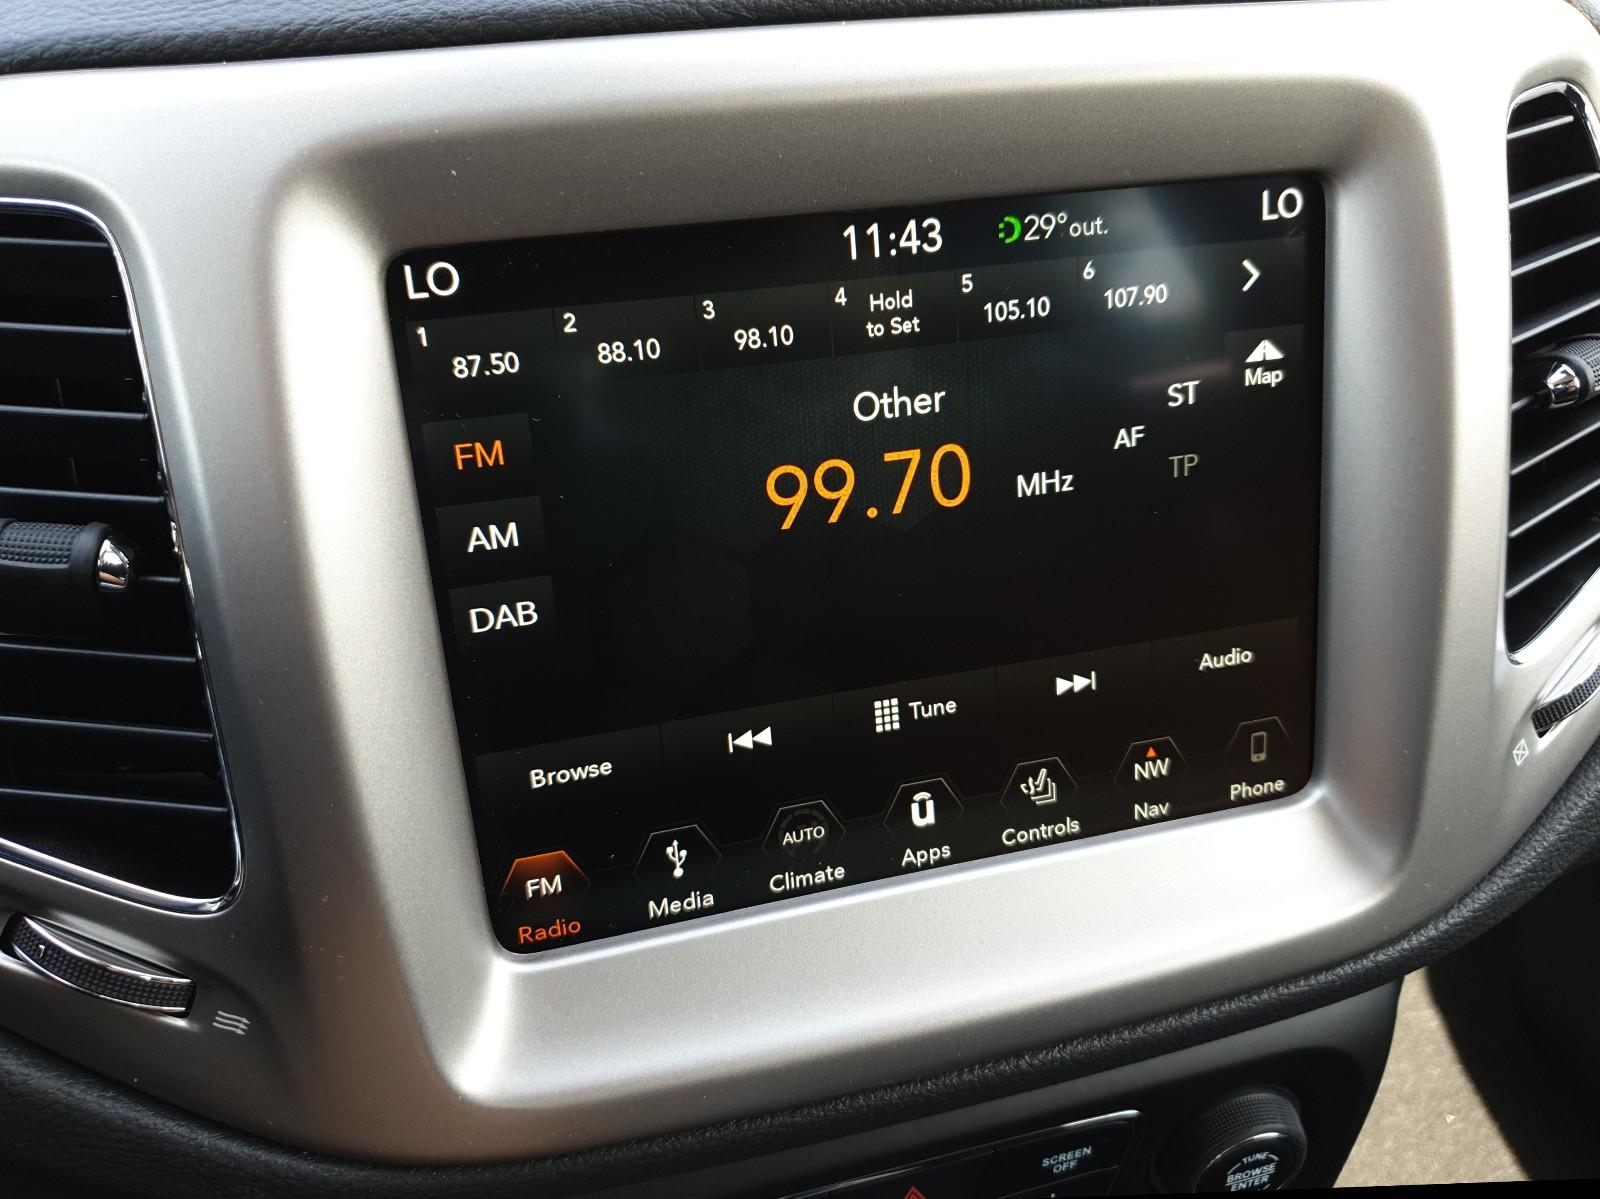 JEEP COMPASS 1.4 MultiAir 140PS Longitude Klimaautomatik Navi Kamera Keyless Viscaal Fahrzeuggrosshandel GmbH, D-49847 Itterbeck